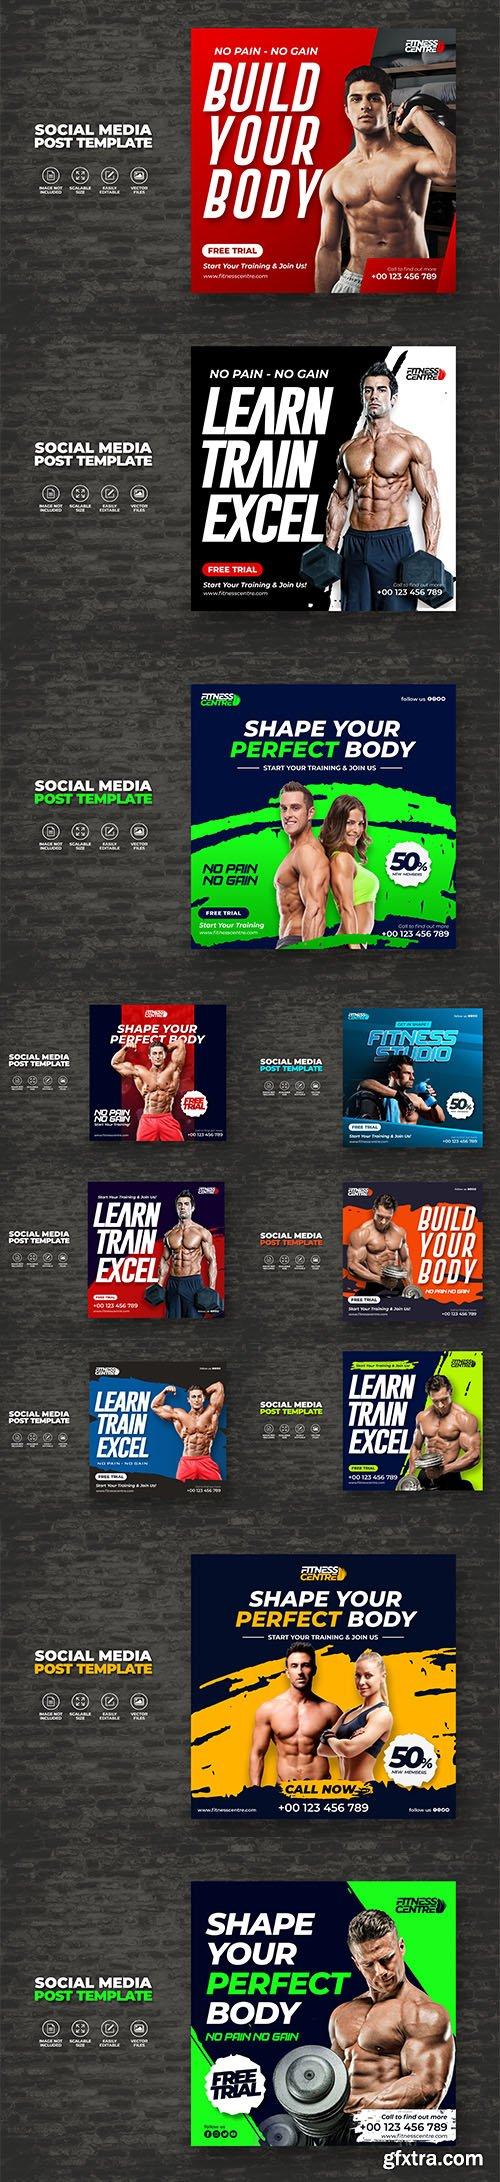 Fitness or gym studio social media banner or square sport flyer